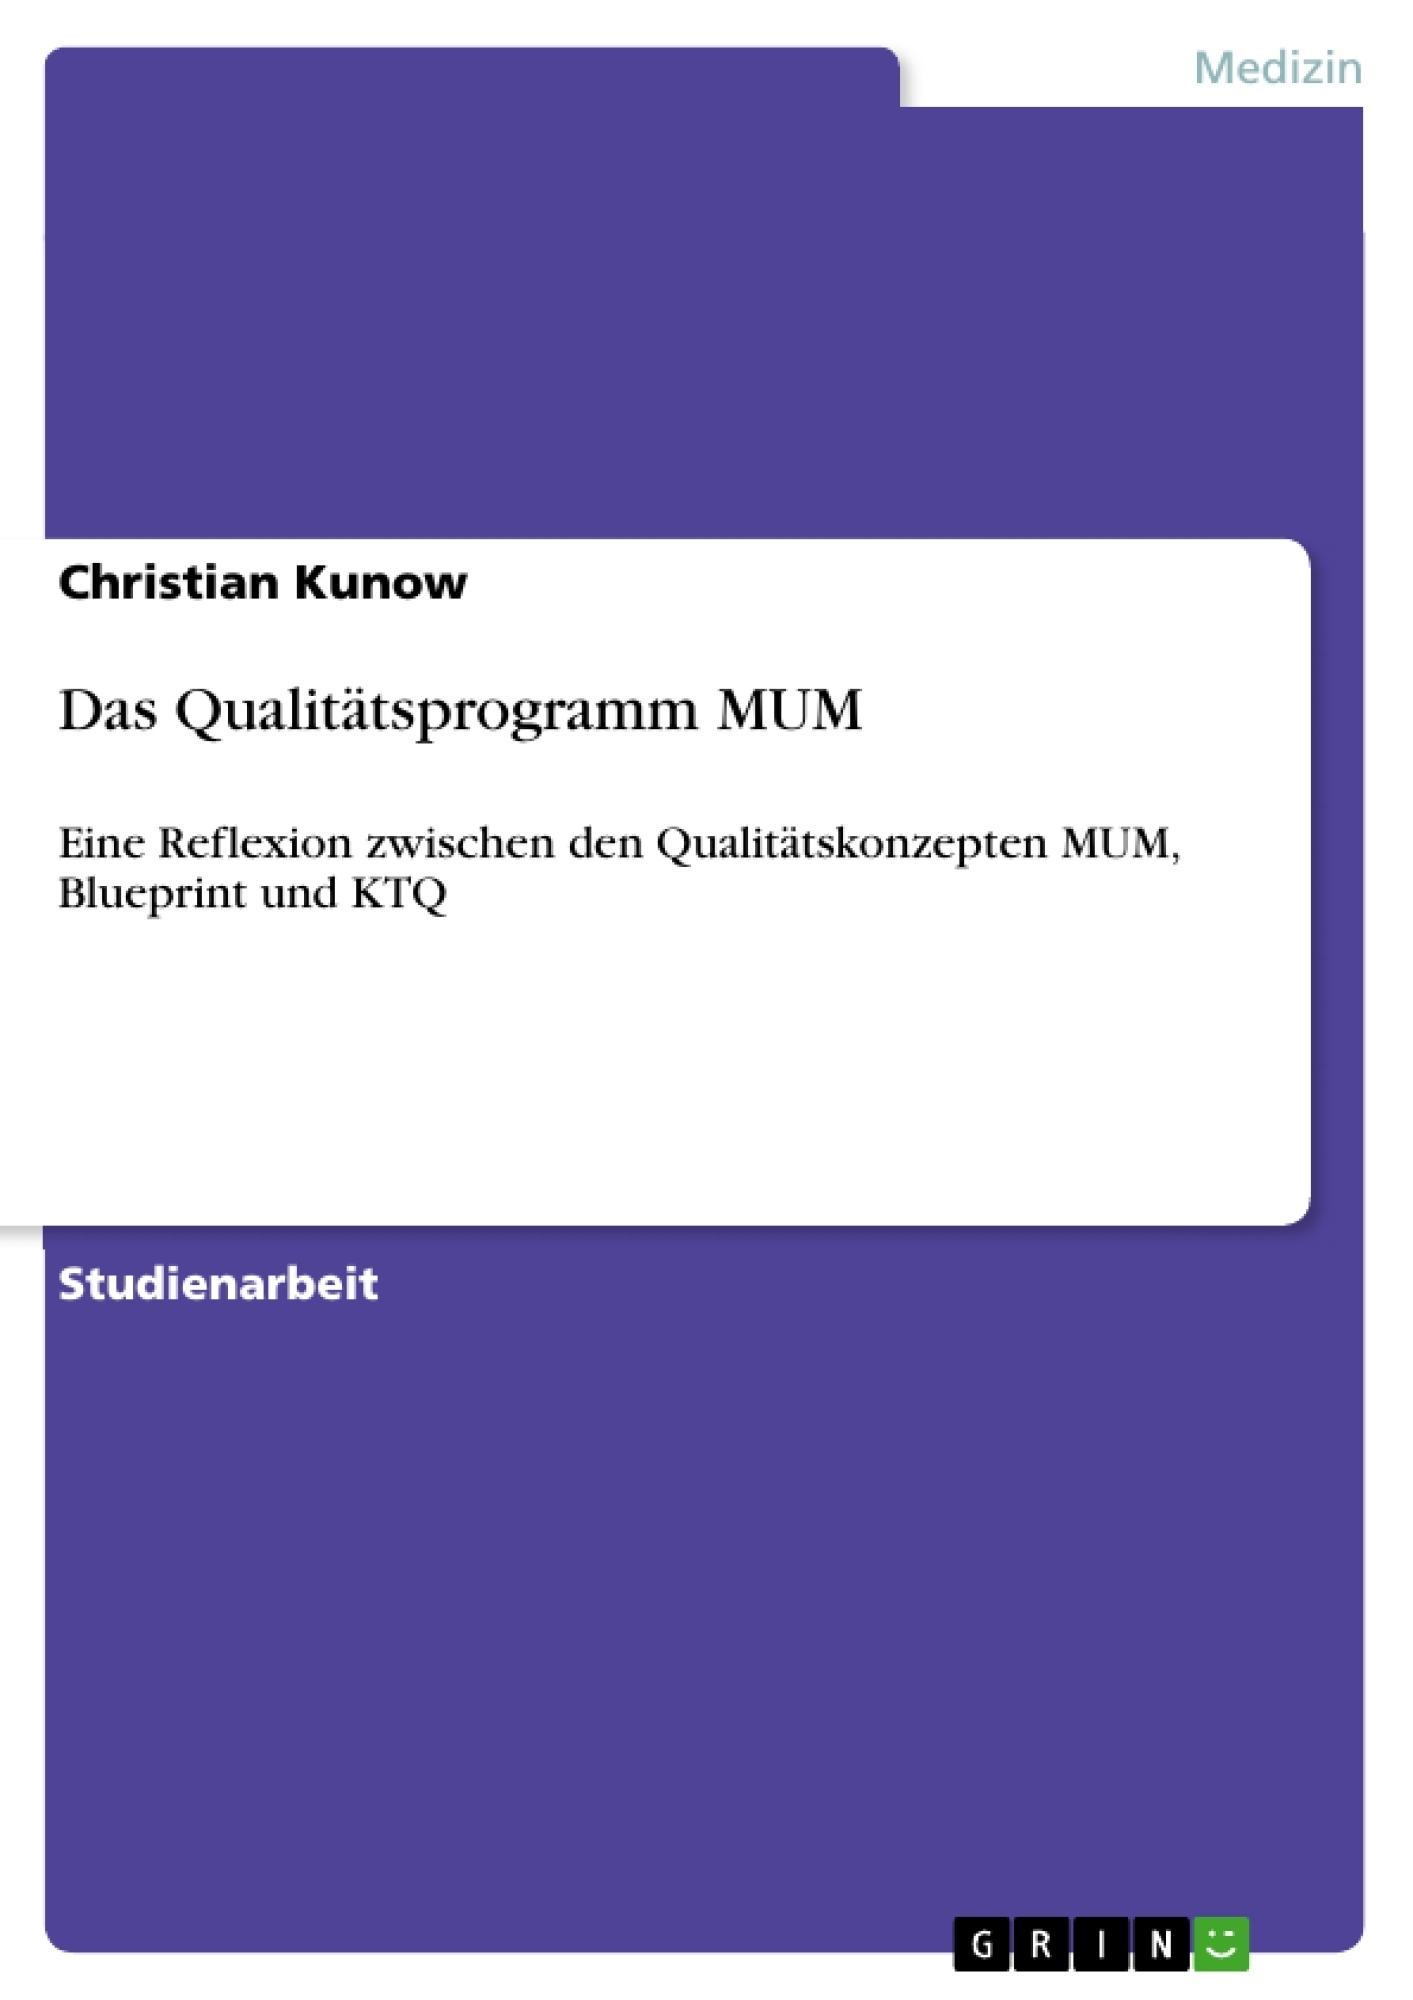 Titel: Das Qualitätsprogramm MUM